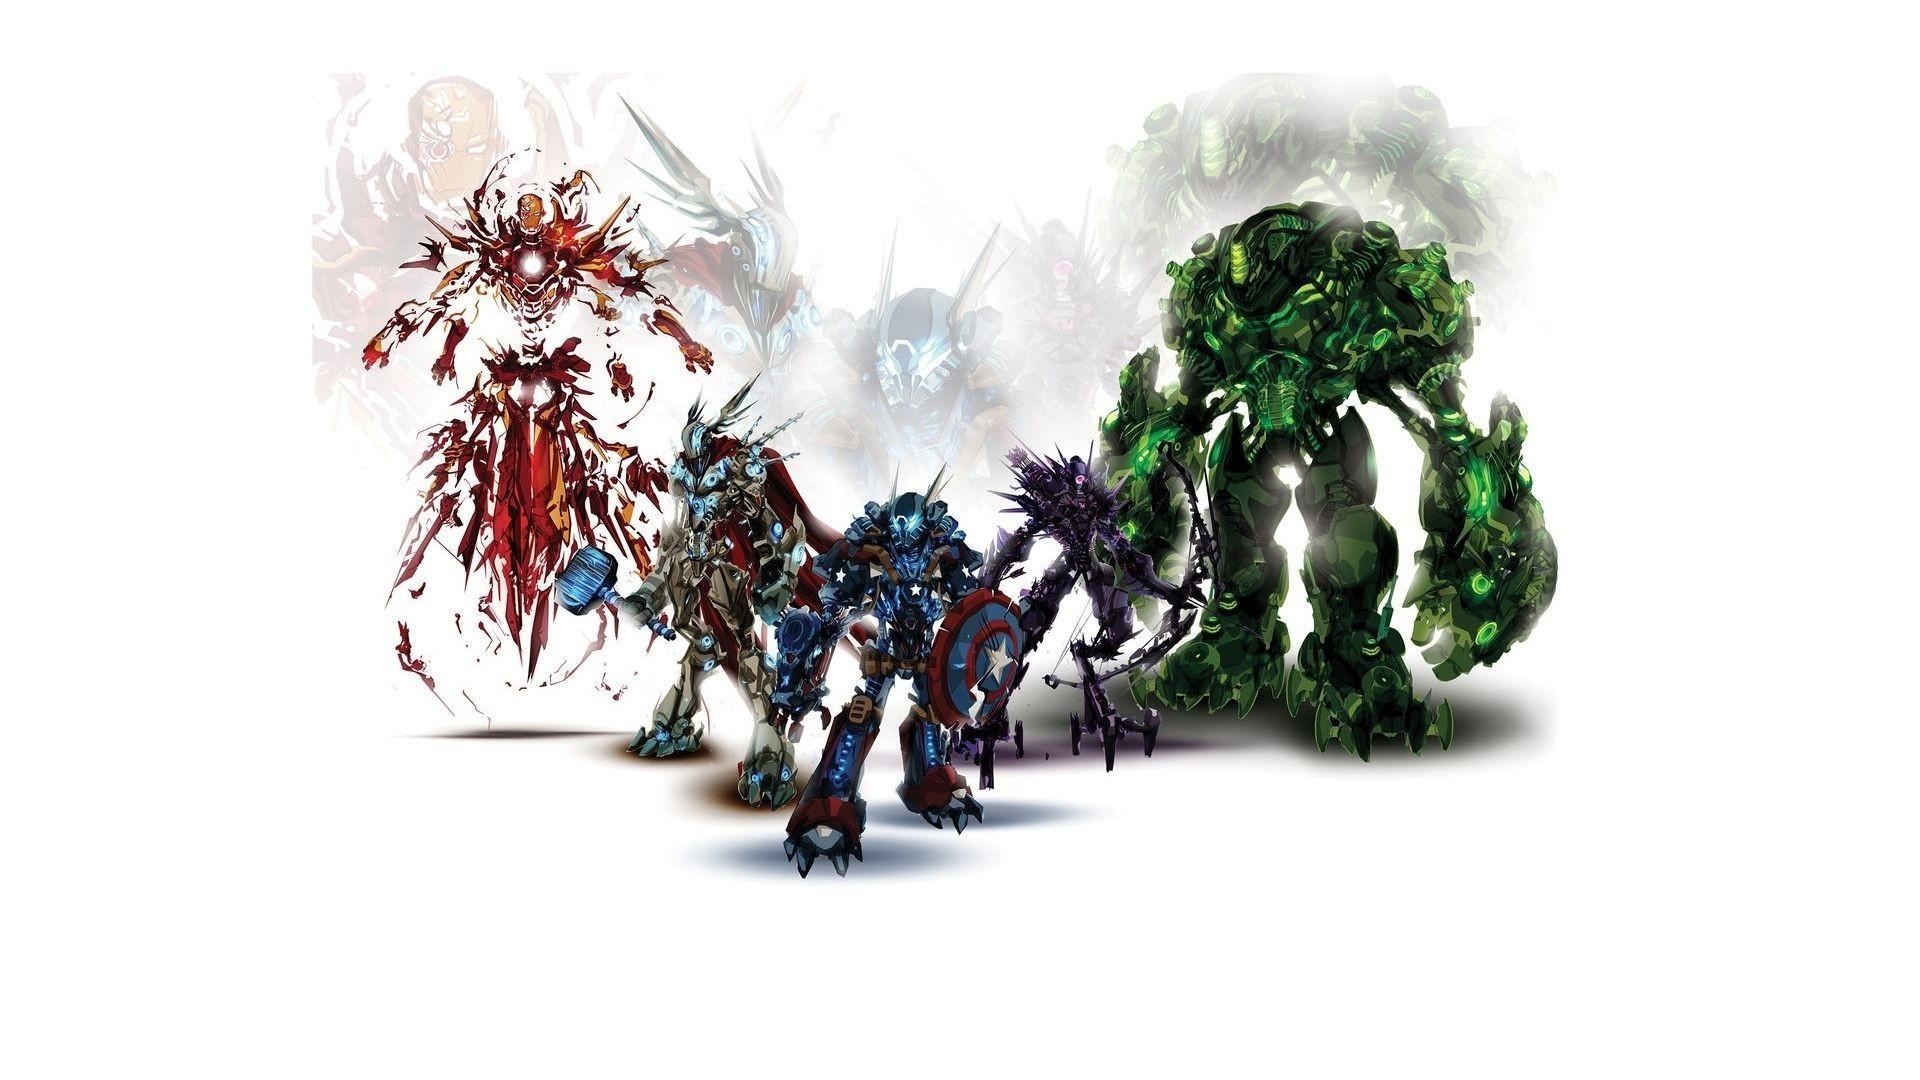 Download Wallpaper Gears heroes, Marvel, Avengers, Iron .